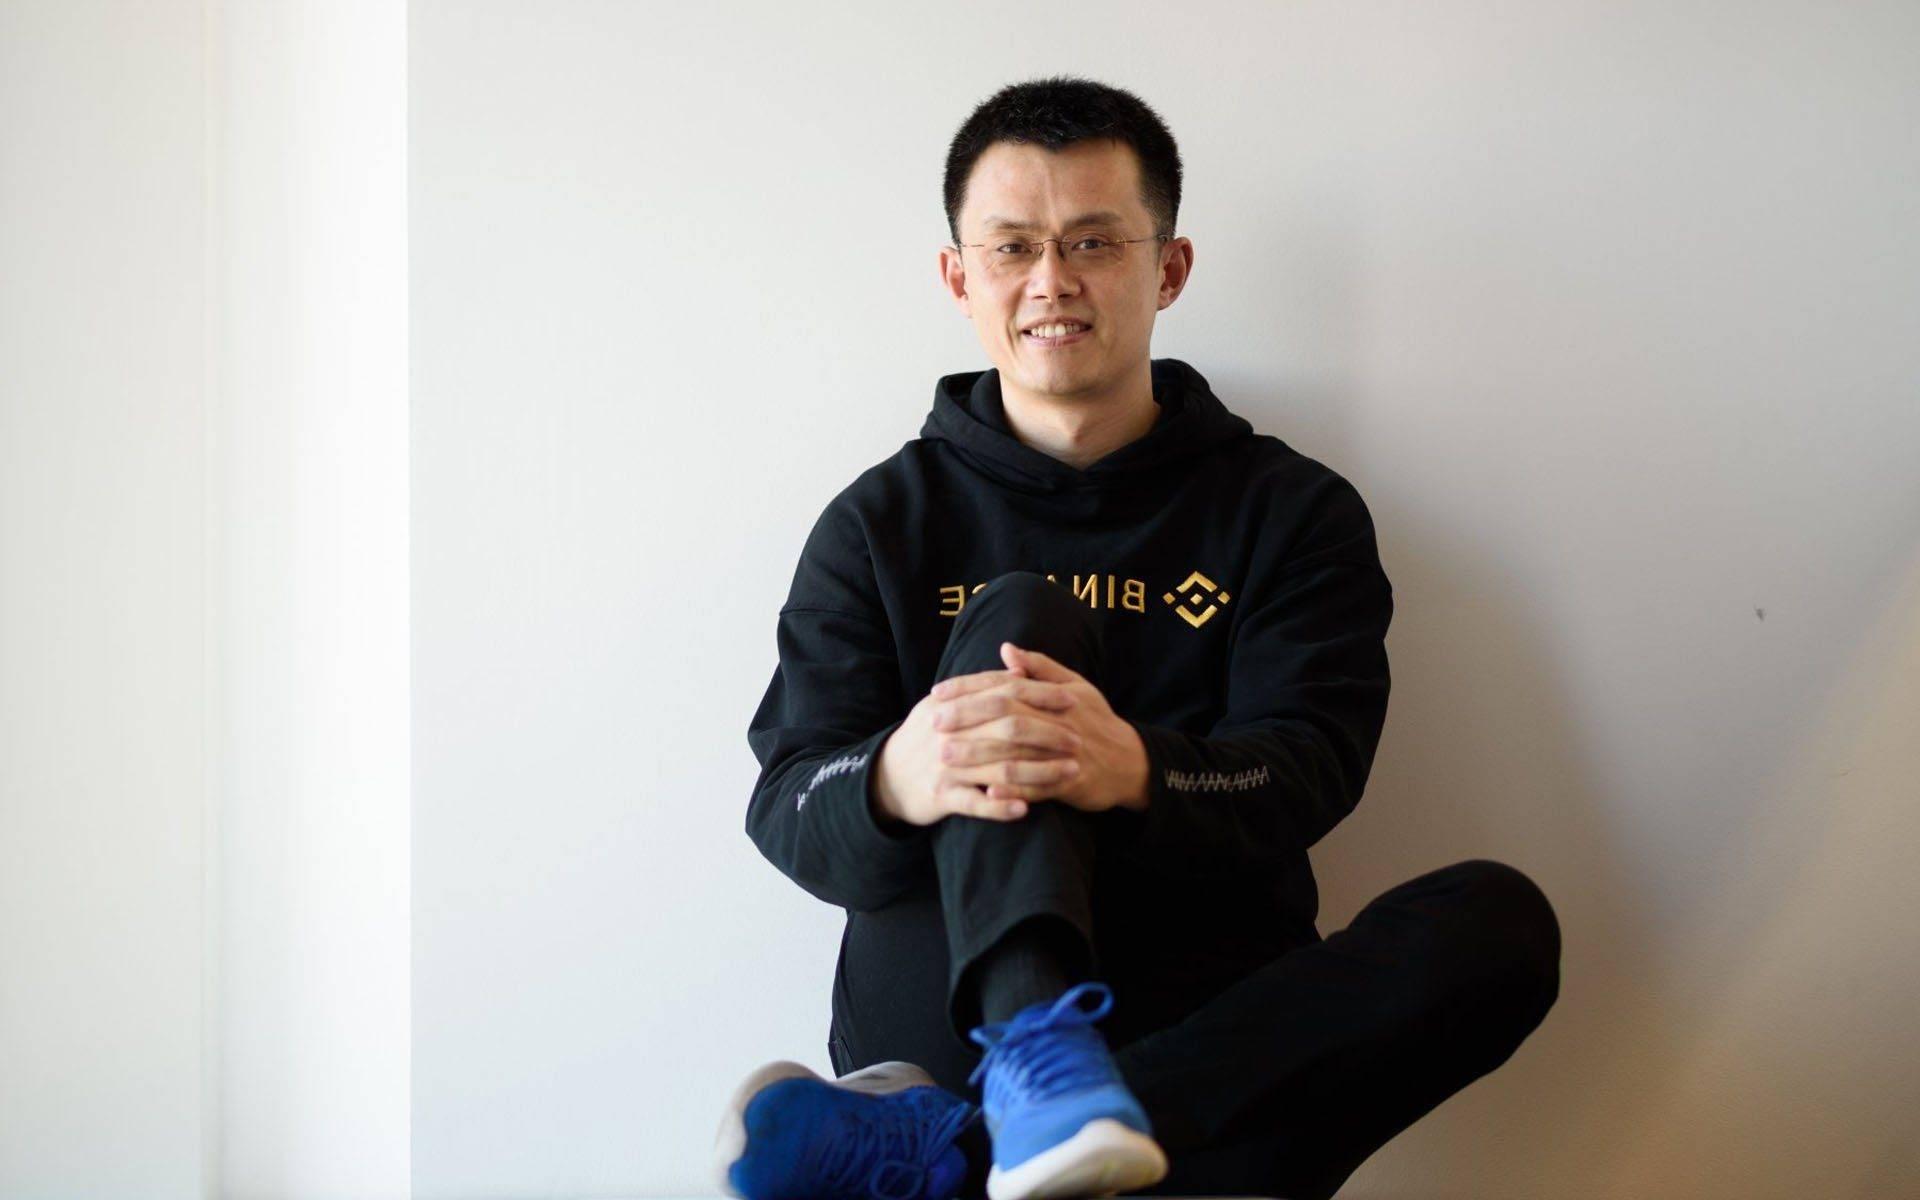 Changpeng Zhao (CZ) désire augmenter le volume de crypto-transactions de Binance